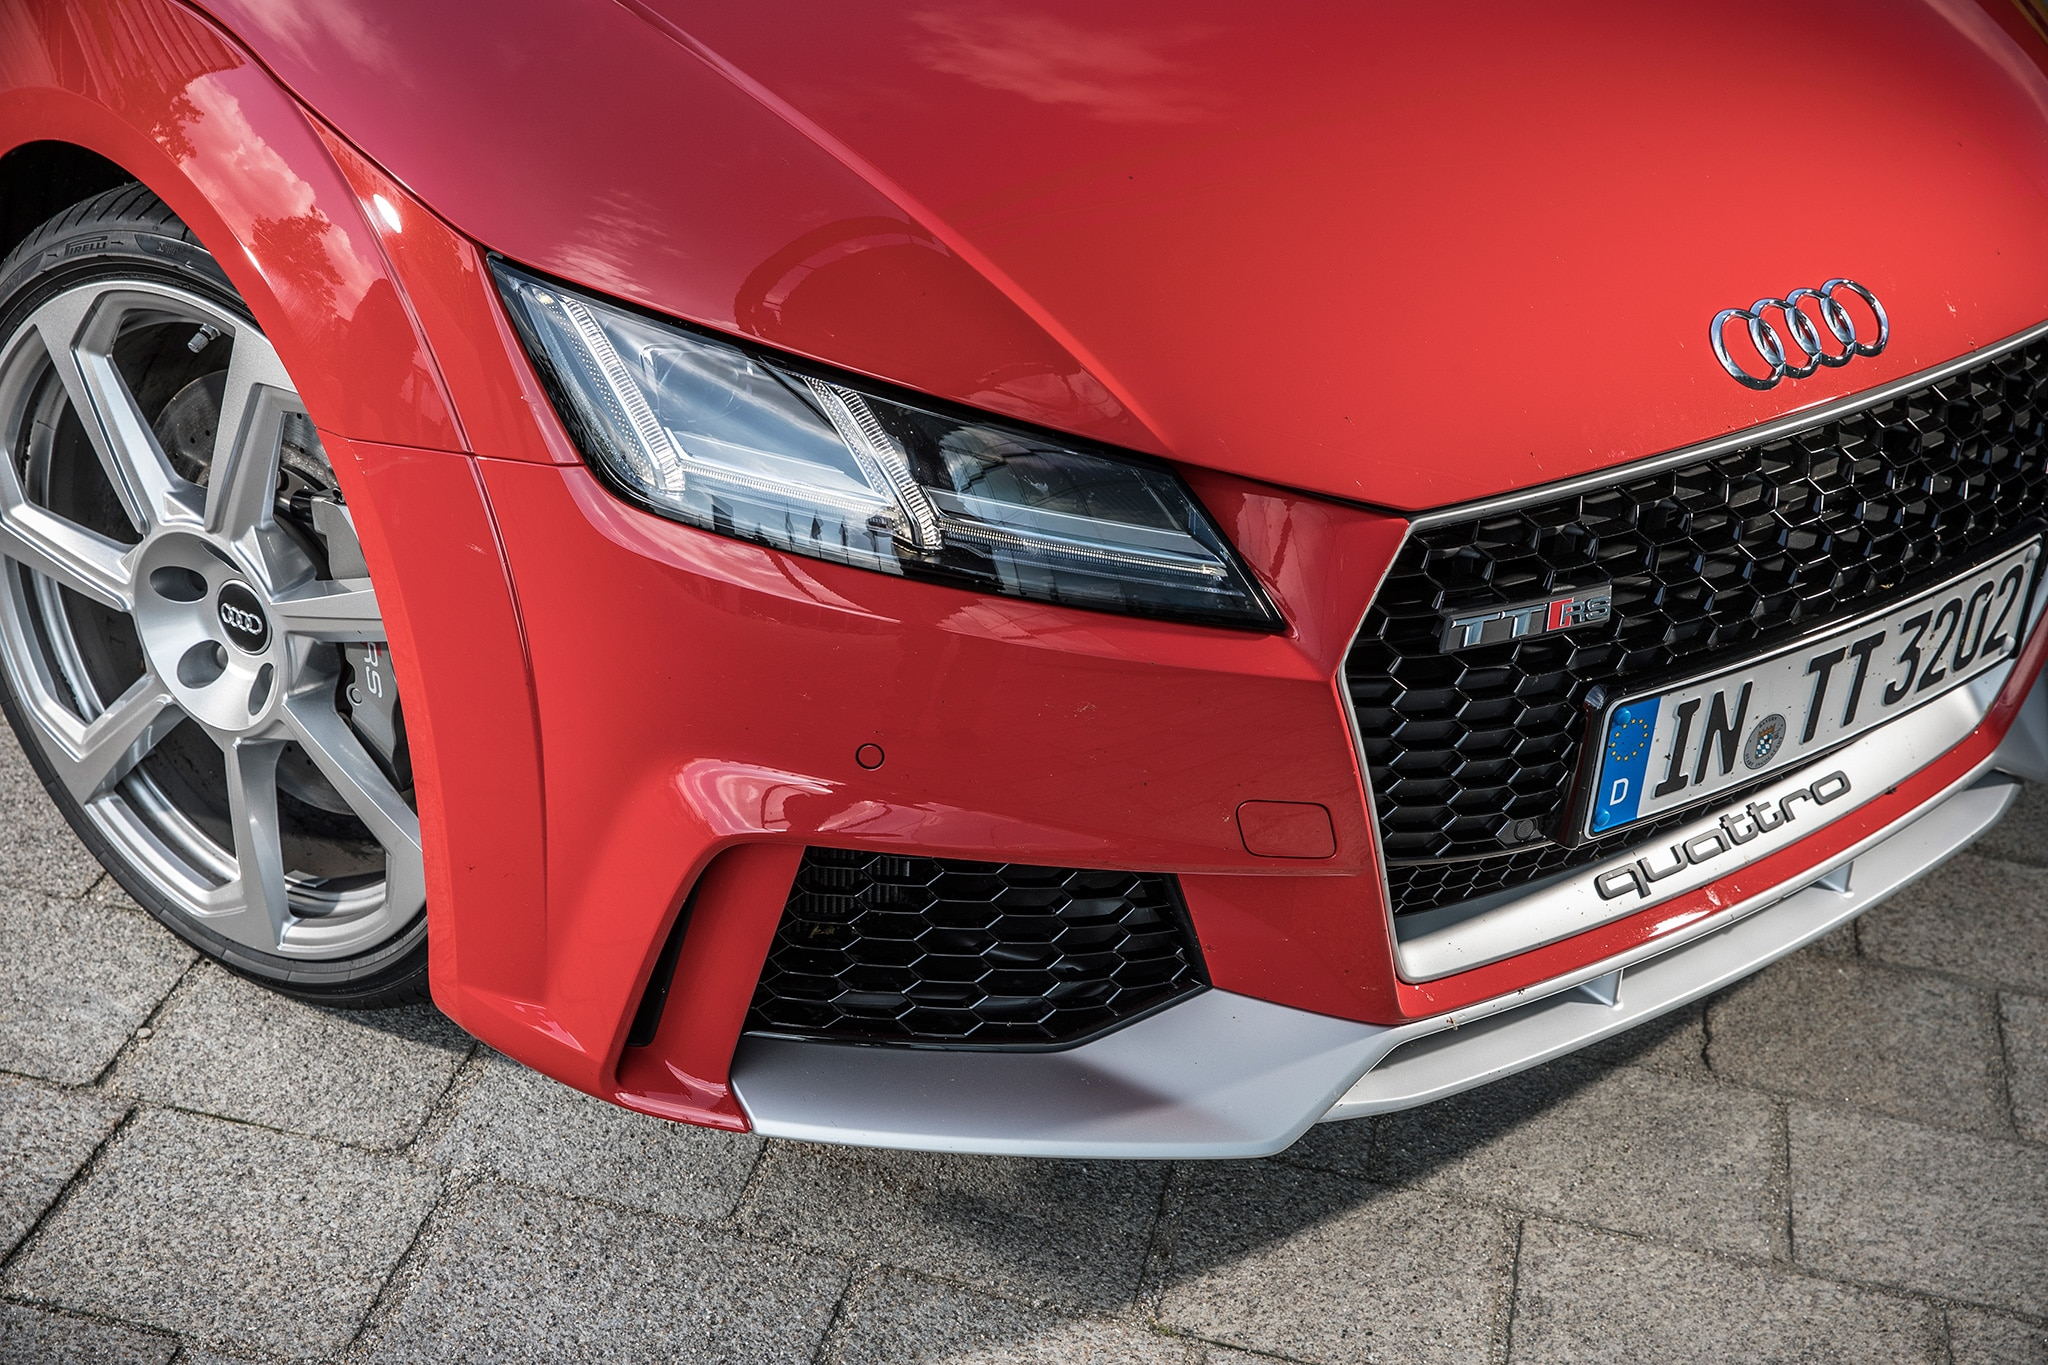 2018 Audi TT RS Front End Detail